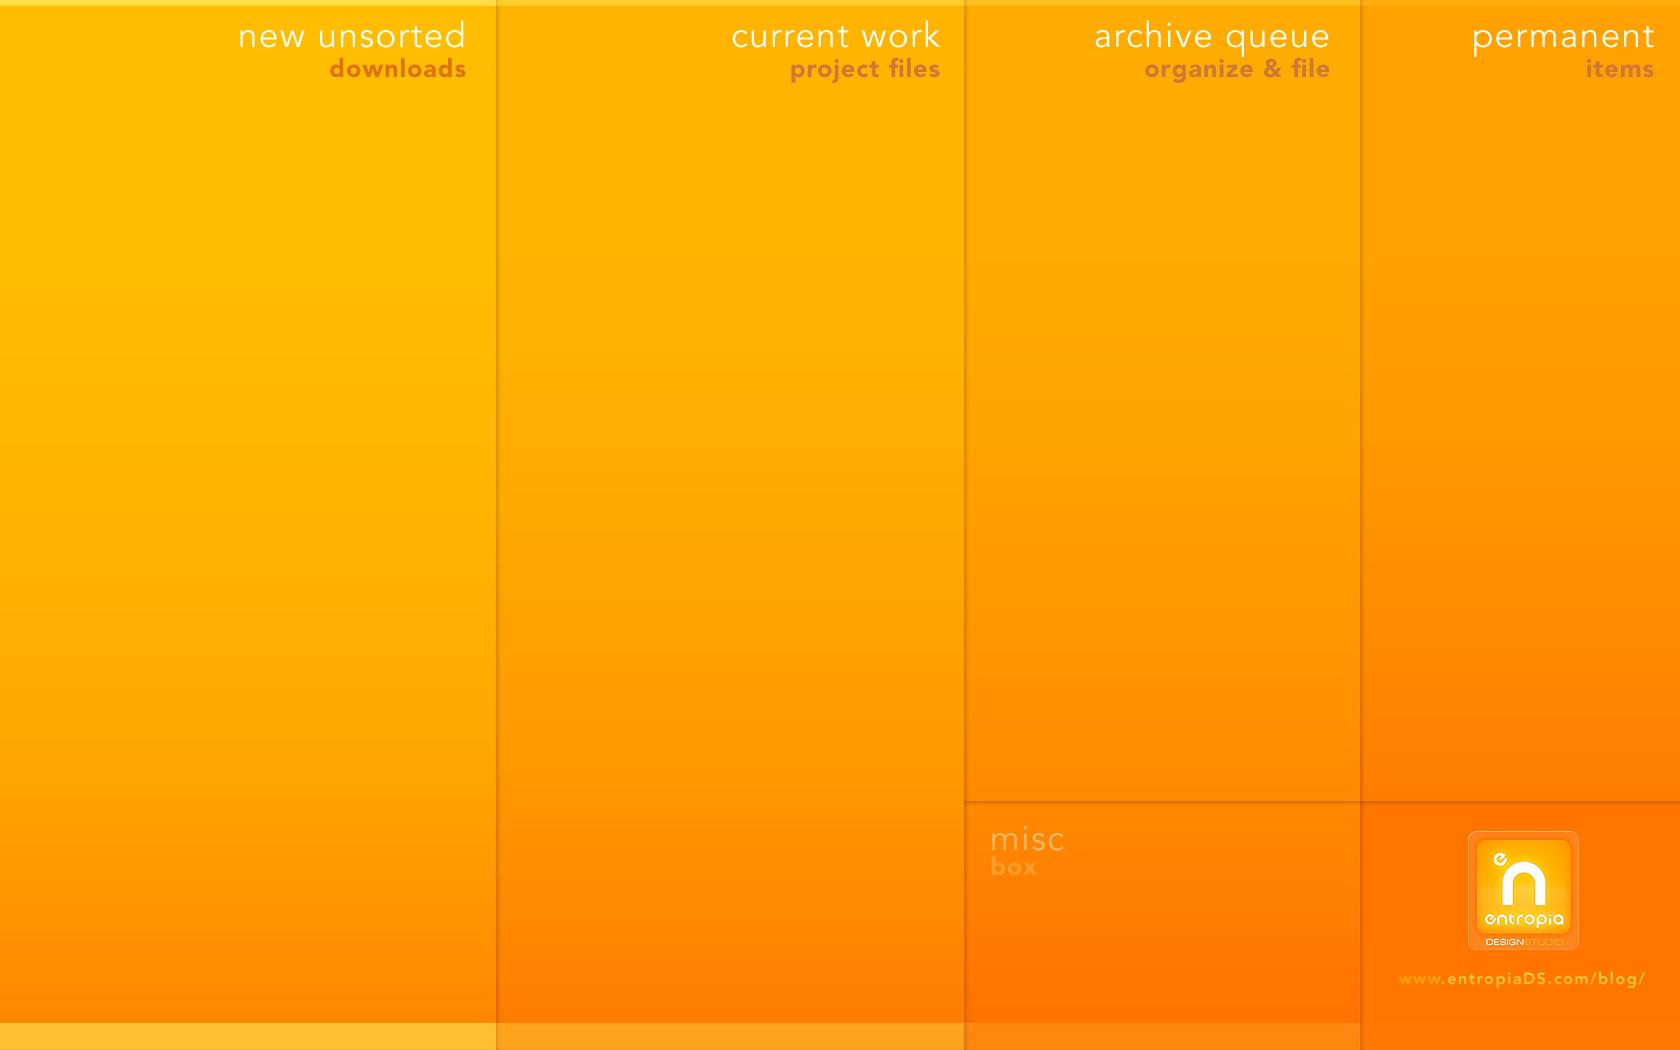 Desktop Organizer Wallpaper Lifehacker 102 images in Collection 1680x1050